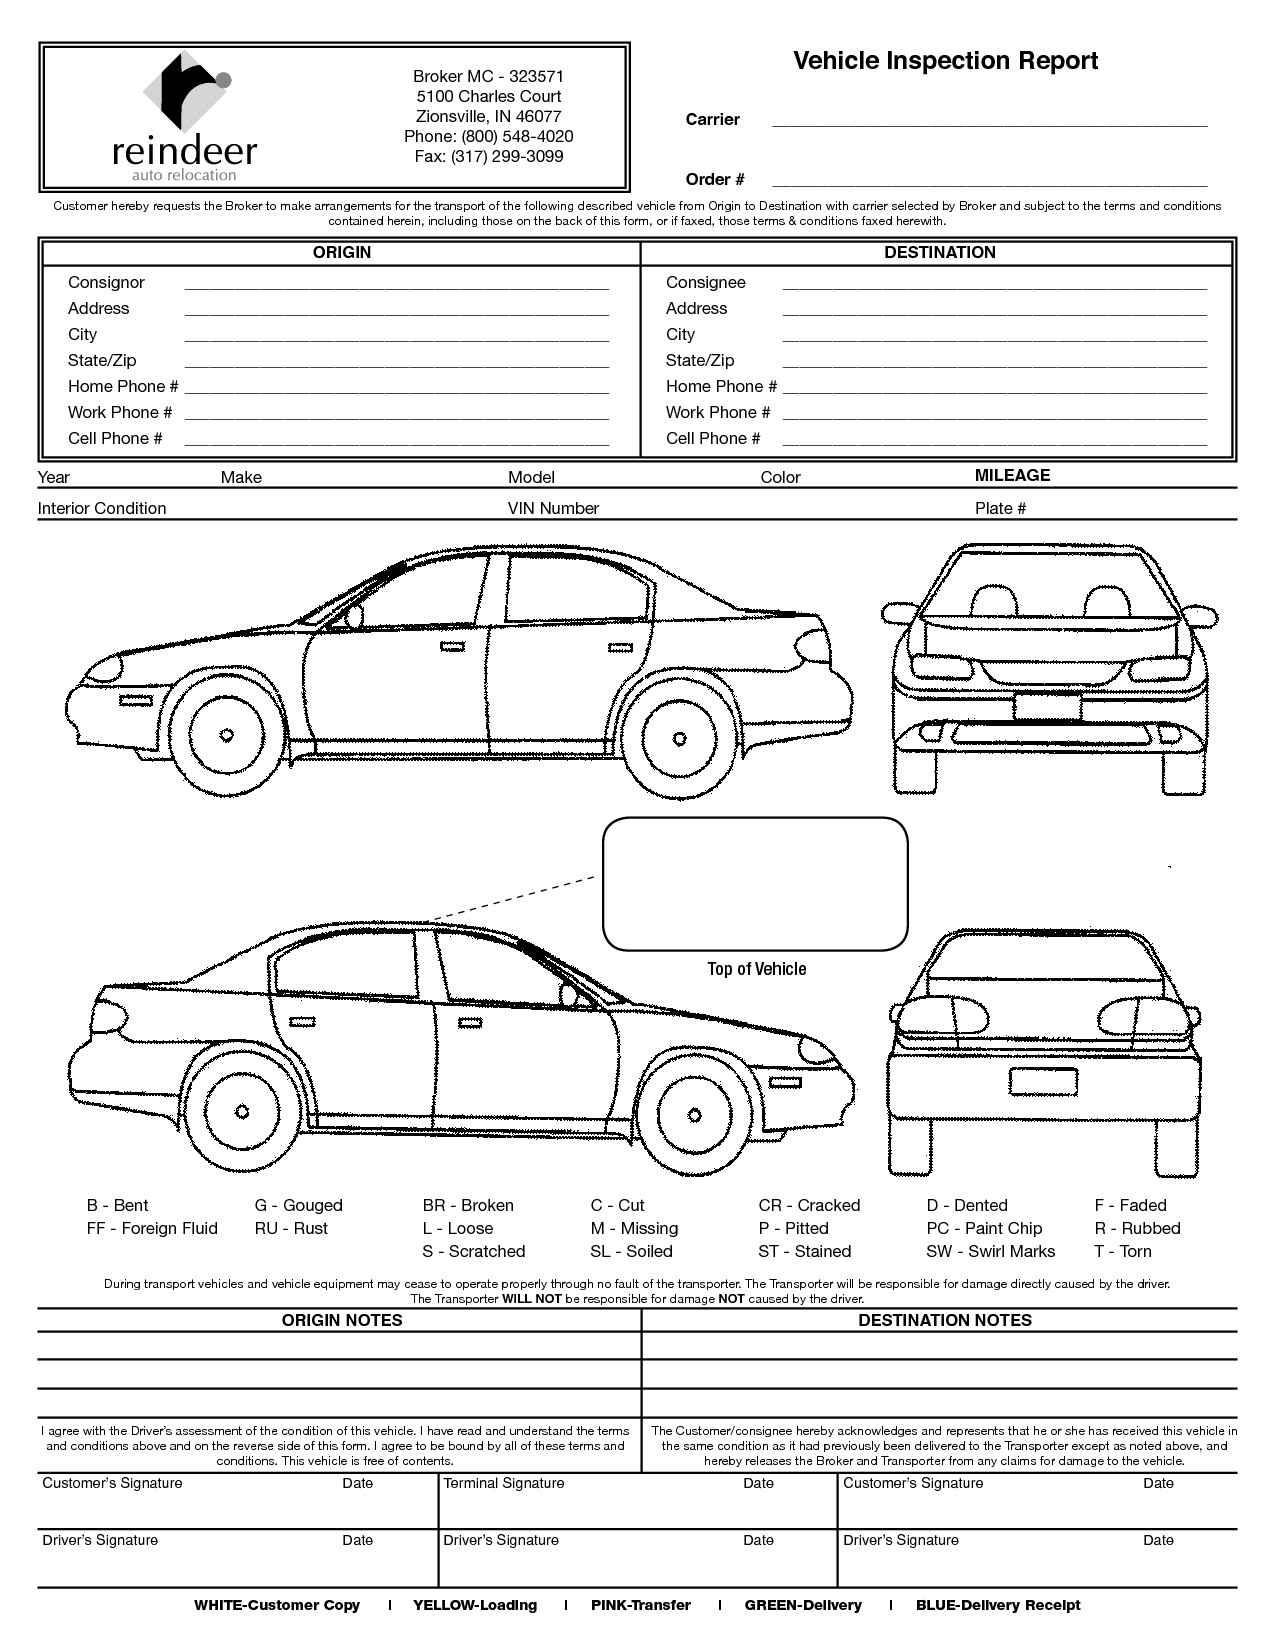 Truck Damage Diagram Vehicle Inspection form Template as Well as Vehicle Damage Diagram Of Truck Damage Diagram